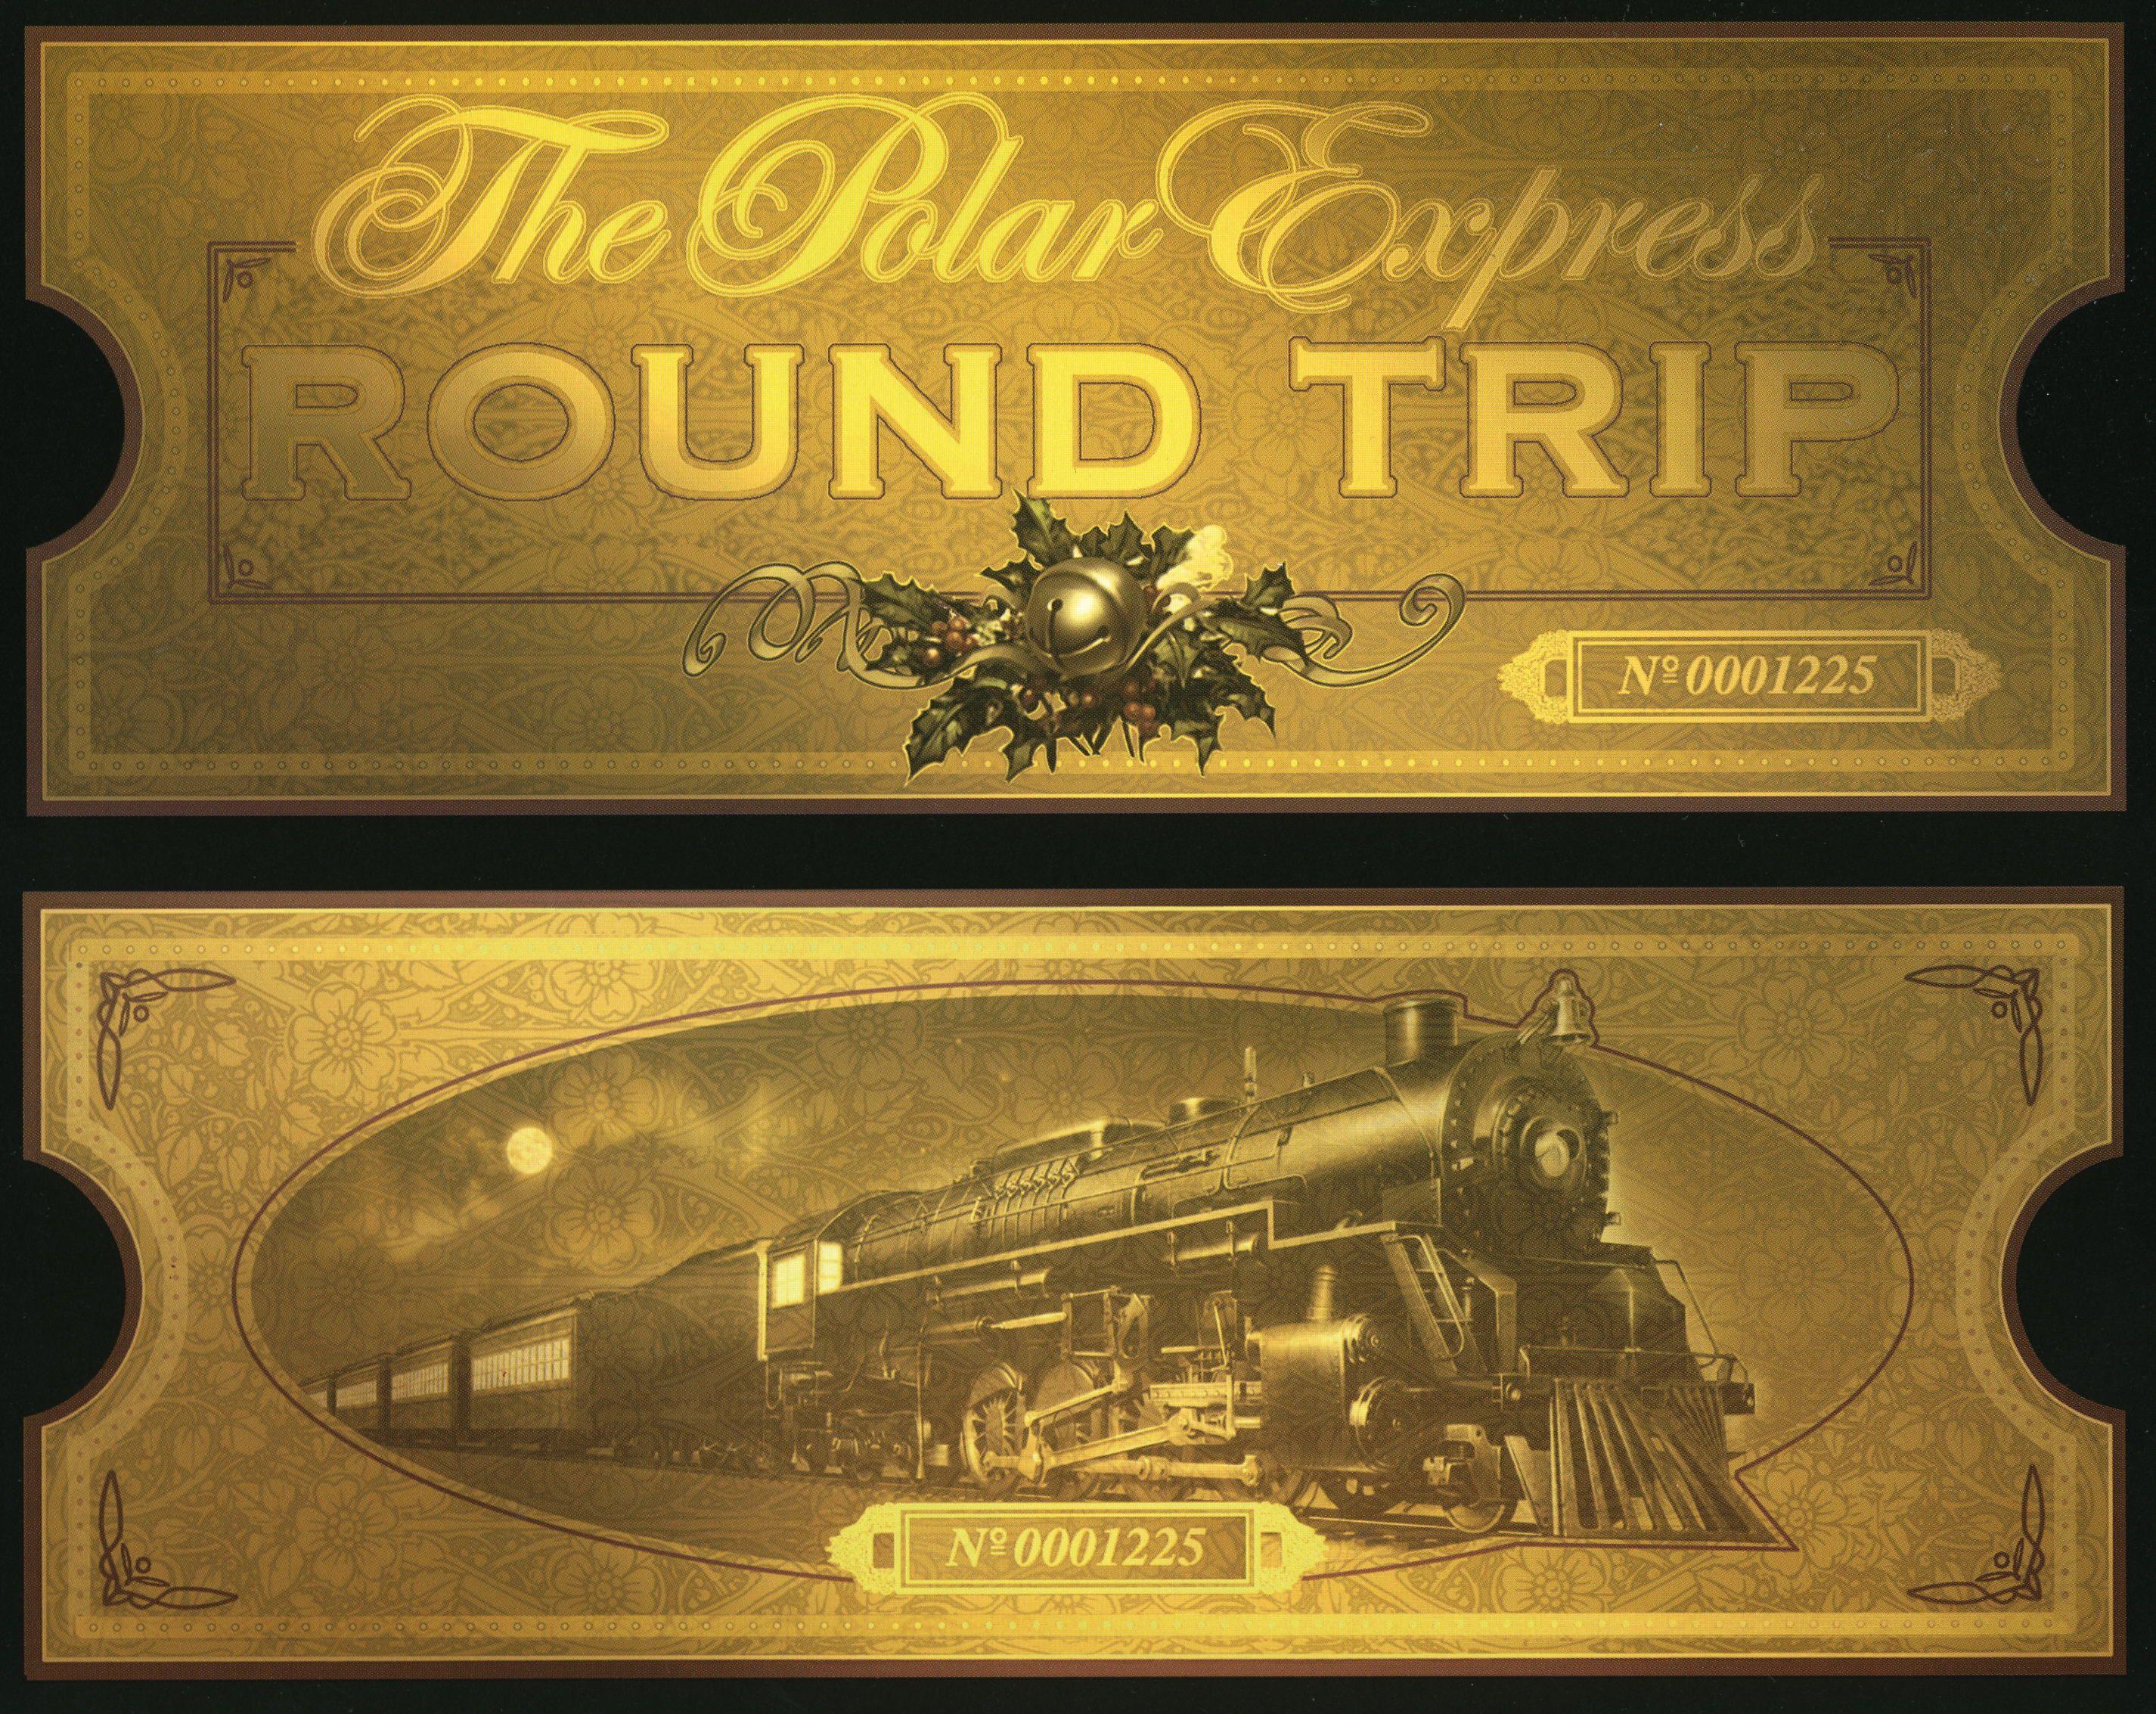 Polar Express Ticket Image